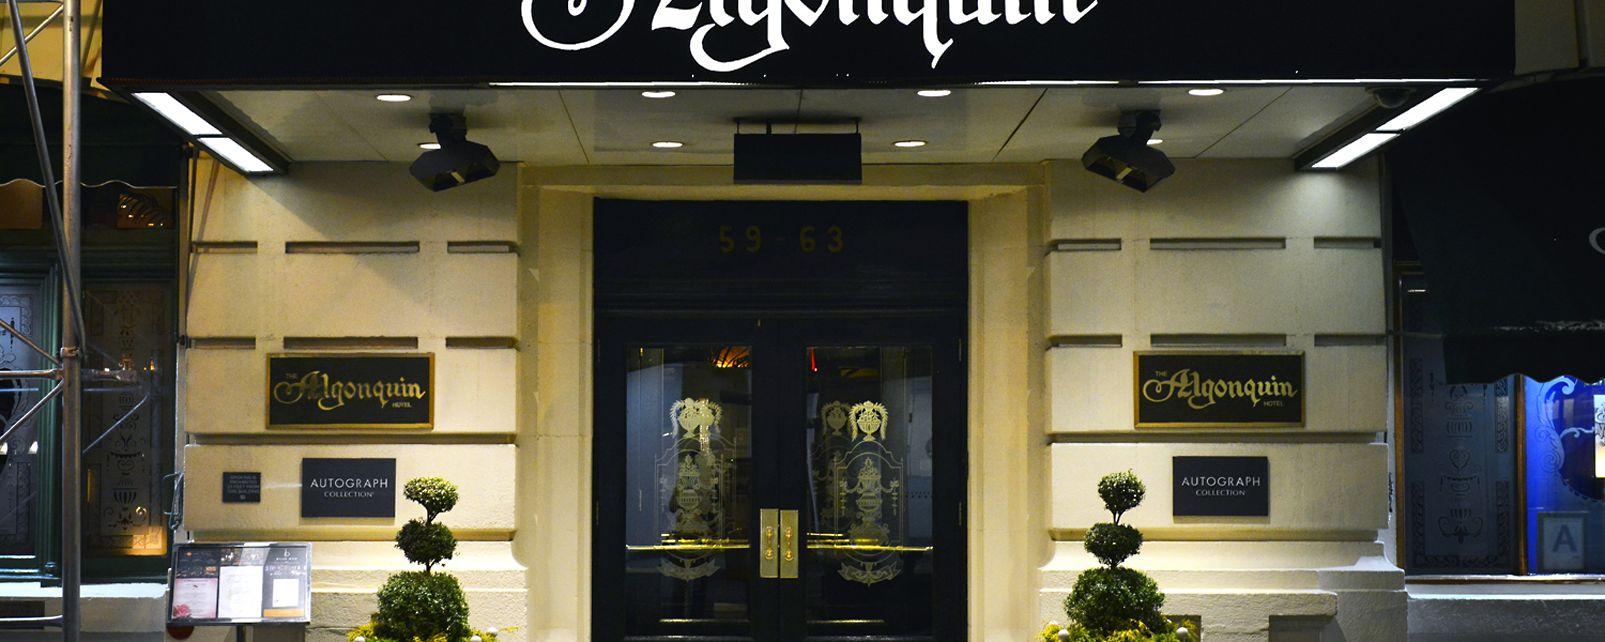 Hôtel Algonquin